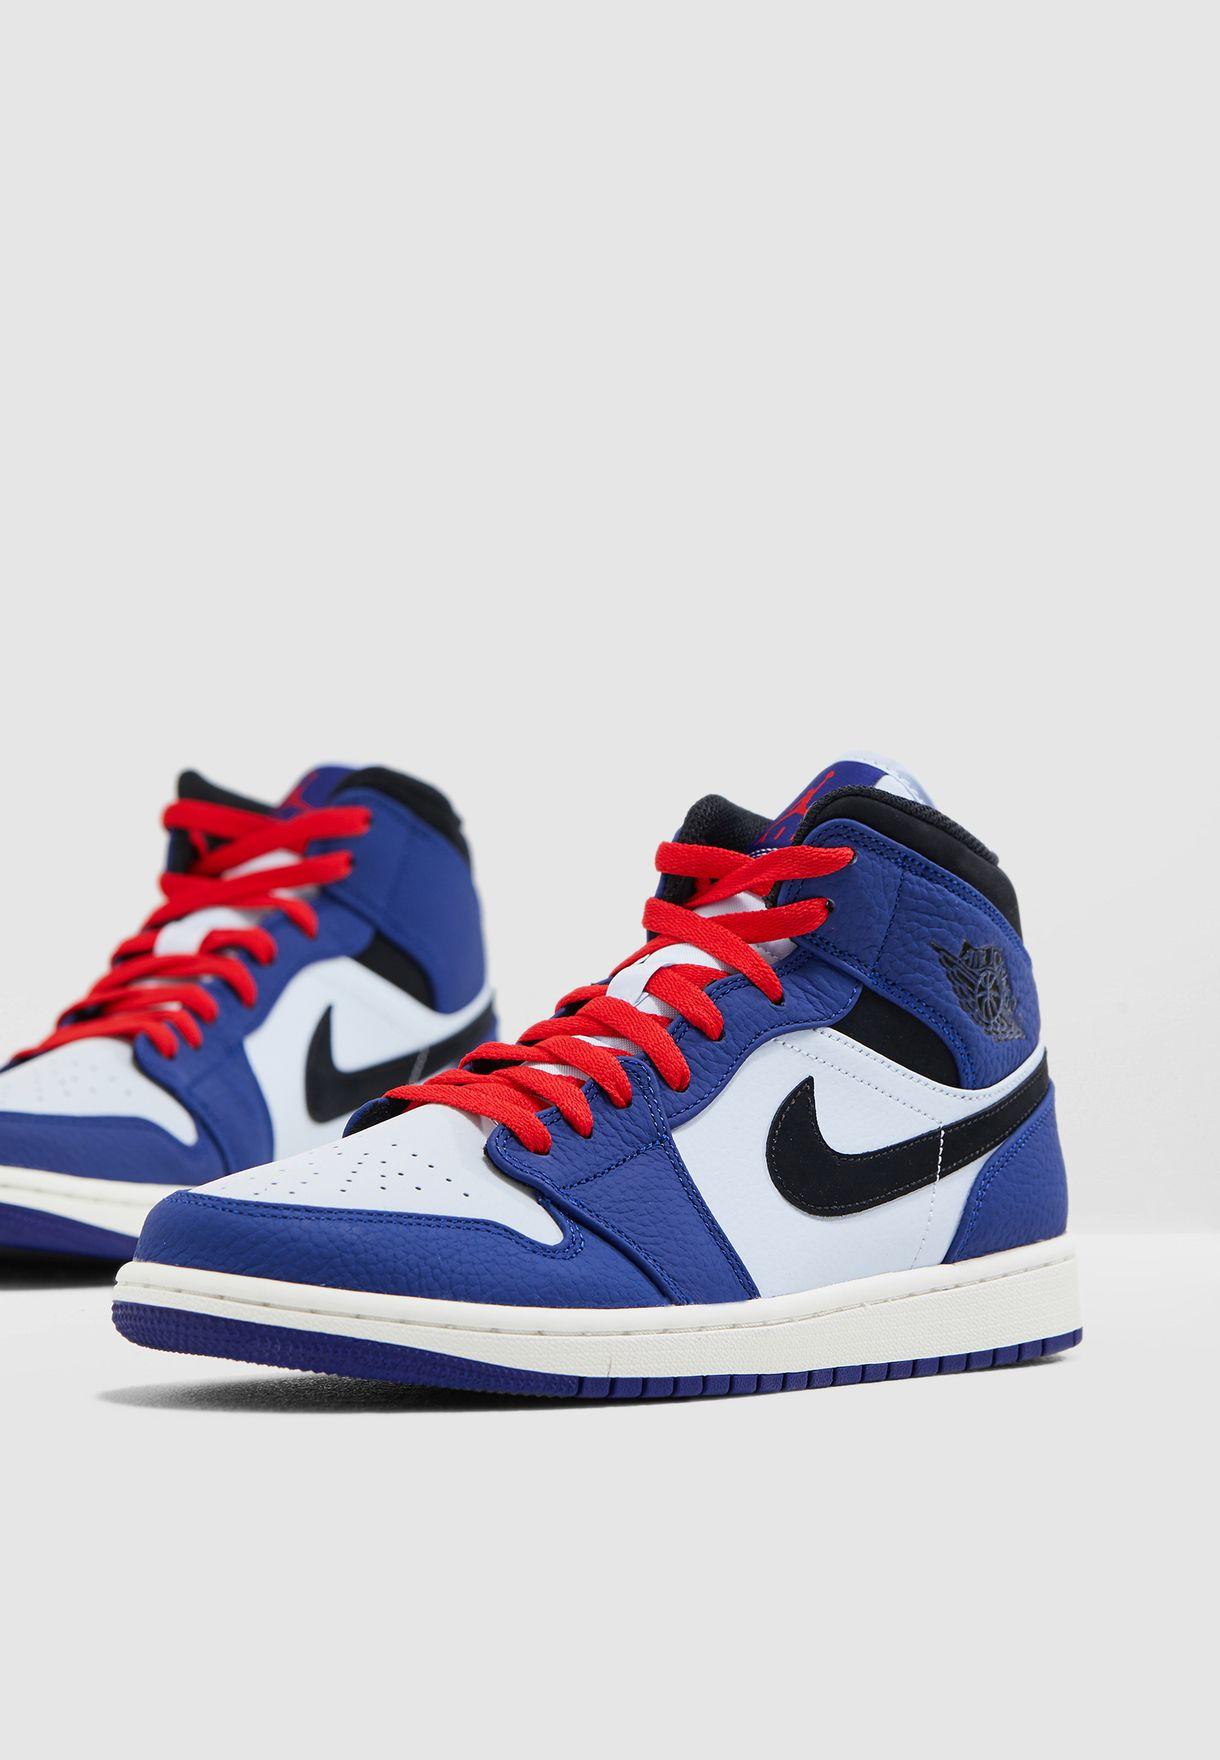 a7bcb035865 Shop Nike blue Air Jordan 1 Mid SE 852542-400 for Men in UAE ...